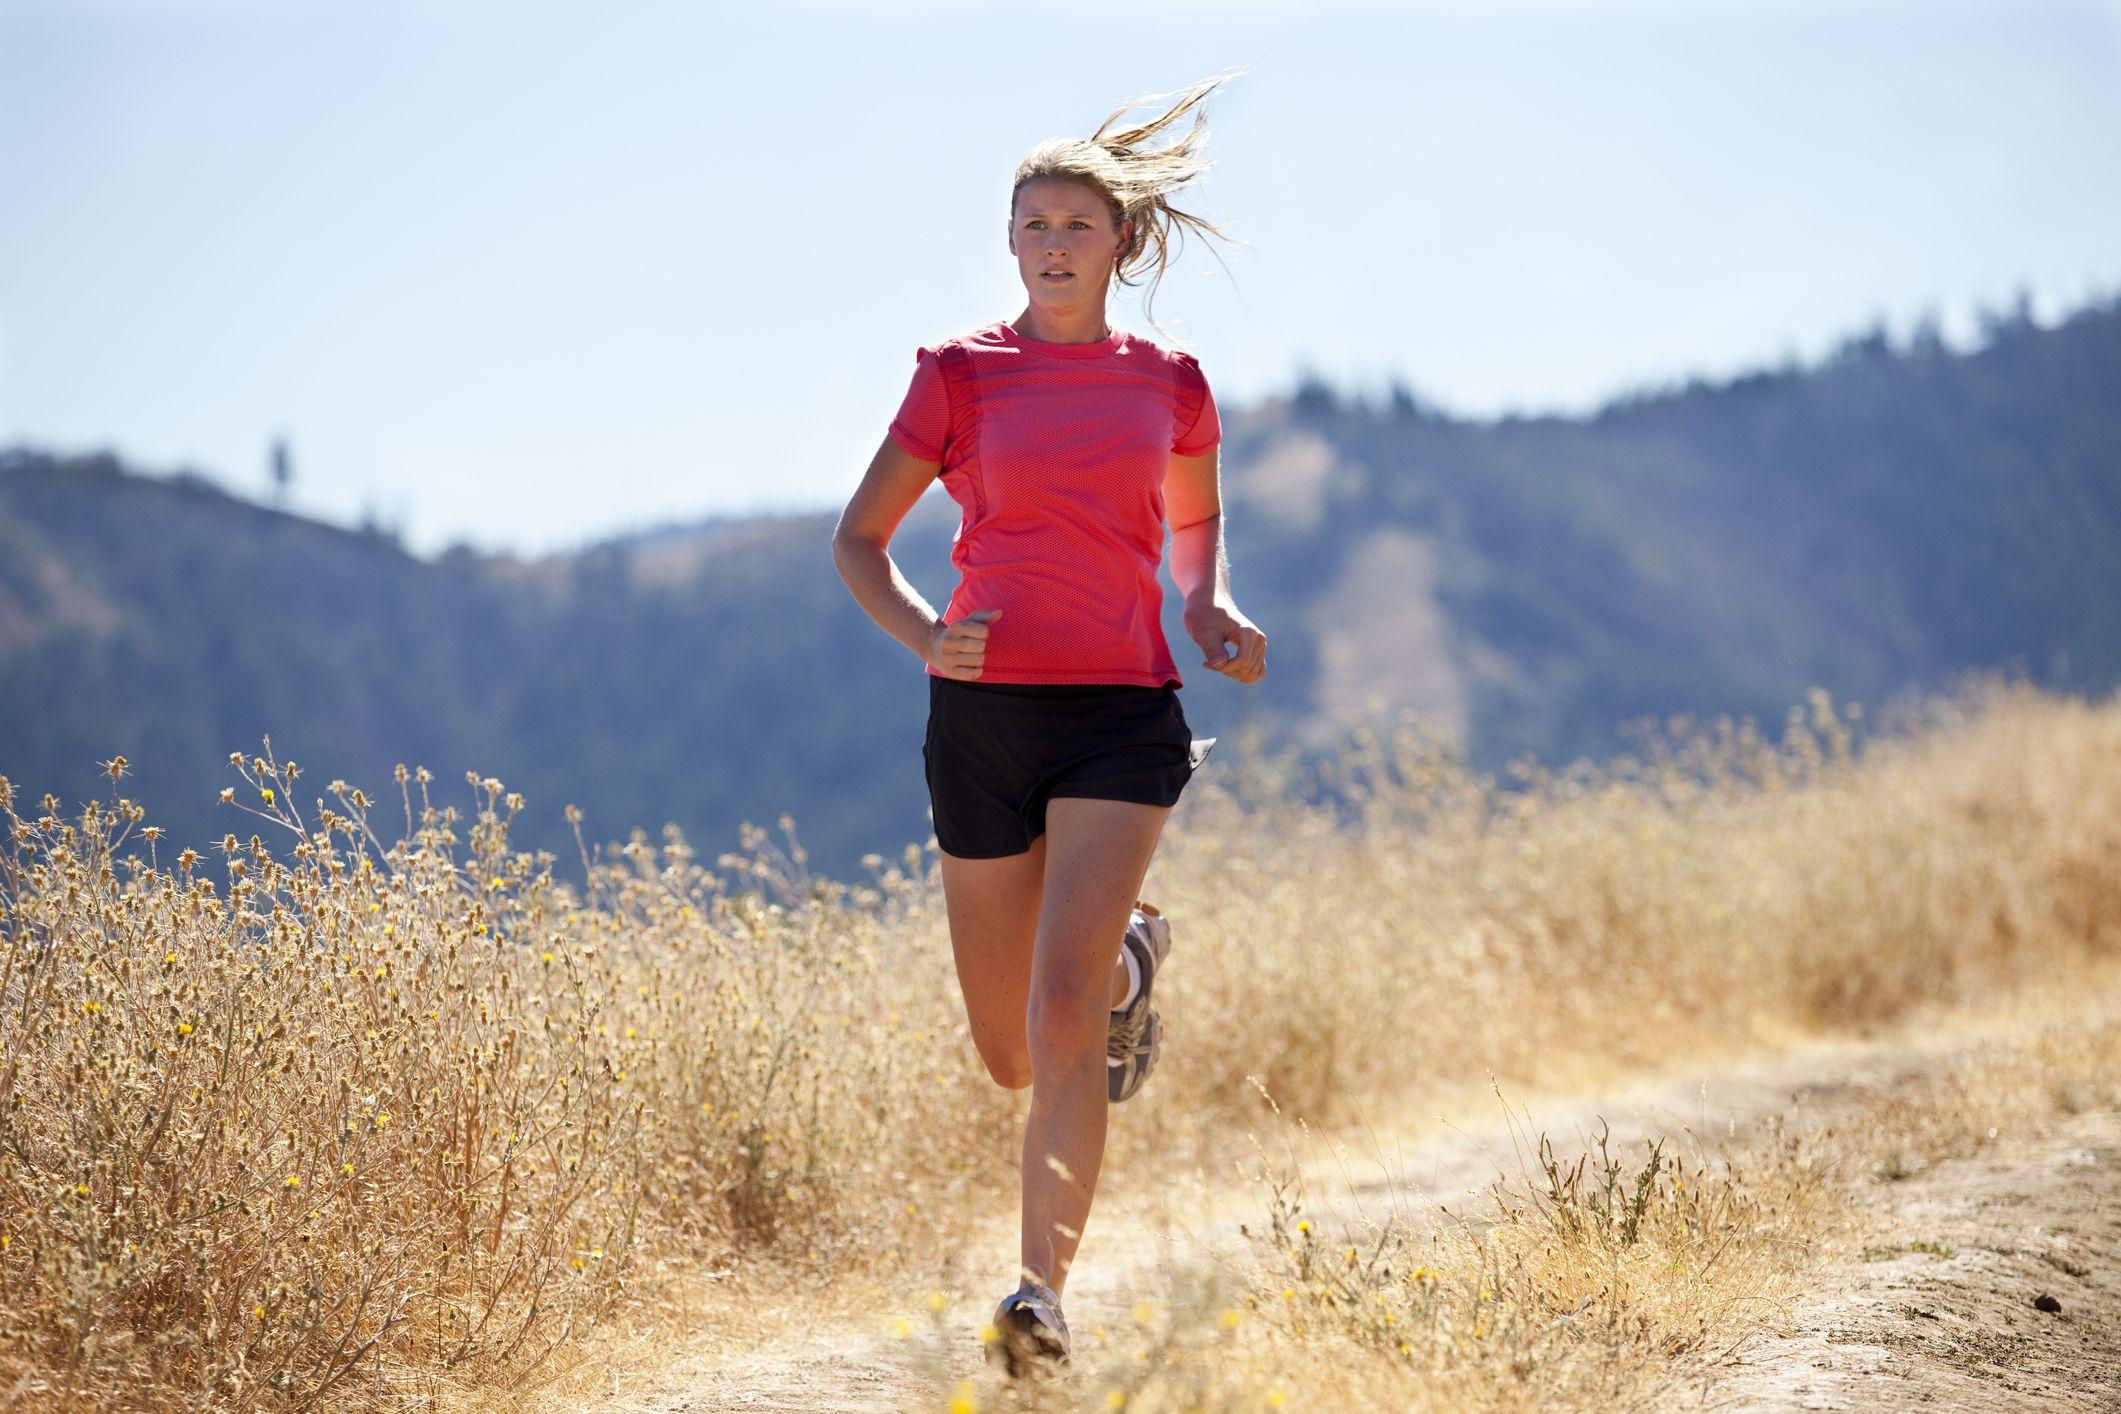 cuantas calorias quemas al correr 4 kilometros